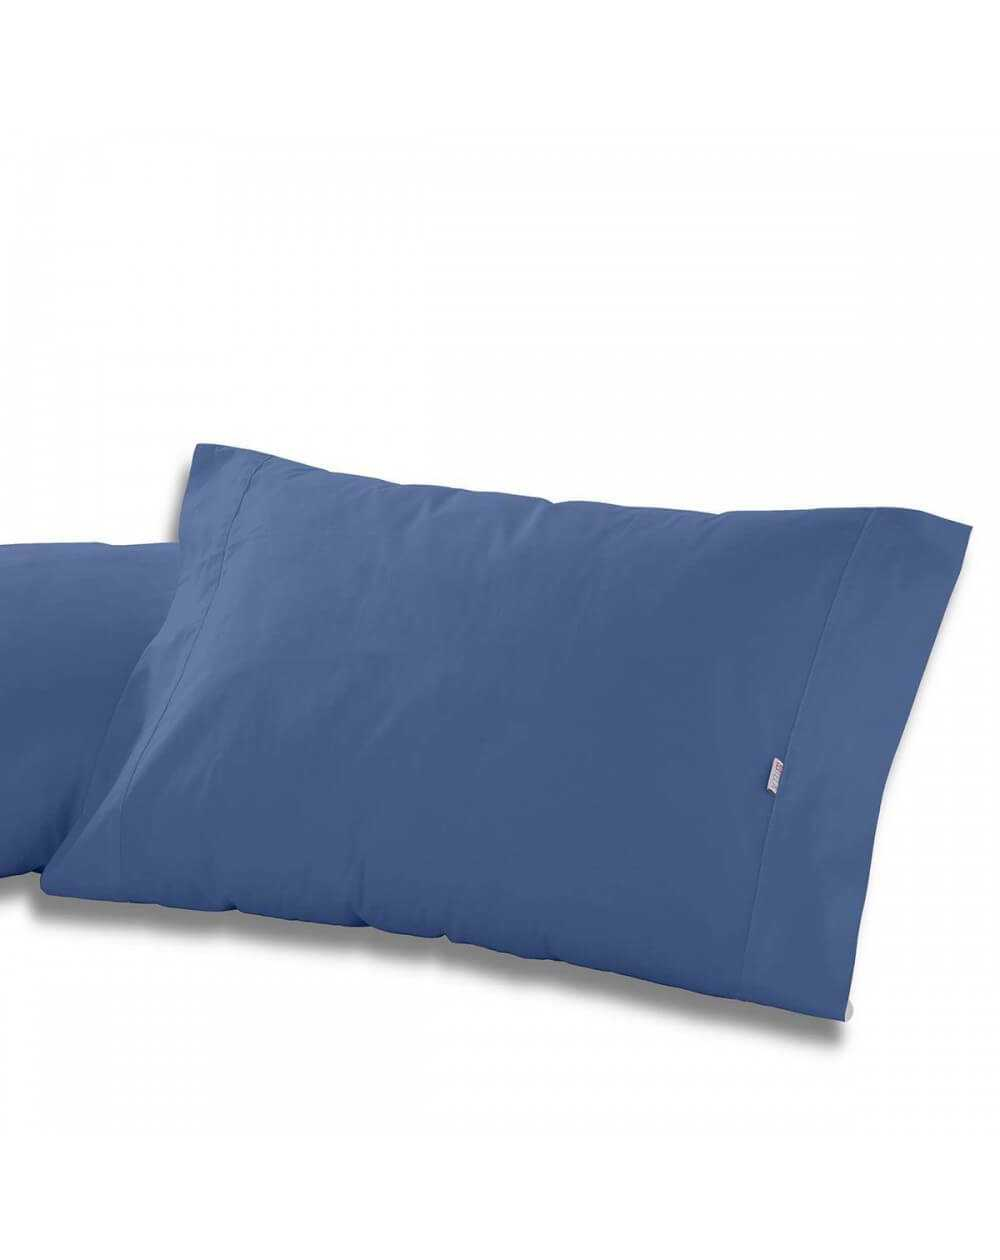 Funda de almohada COMBI LISO 50/50 de EsTela